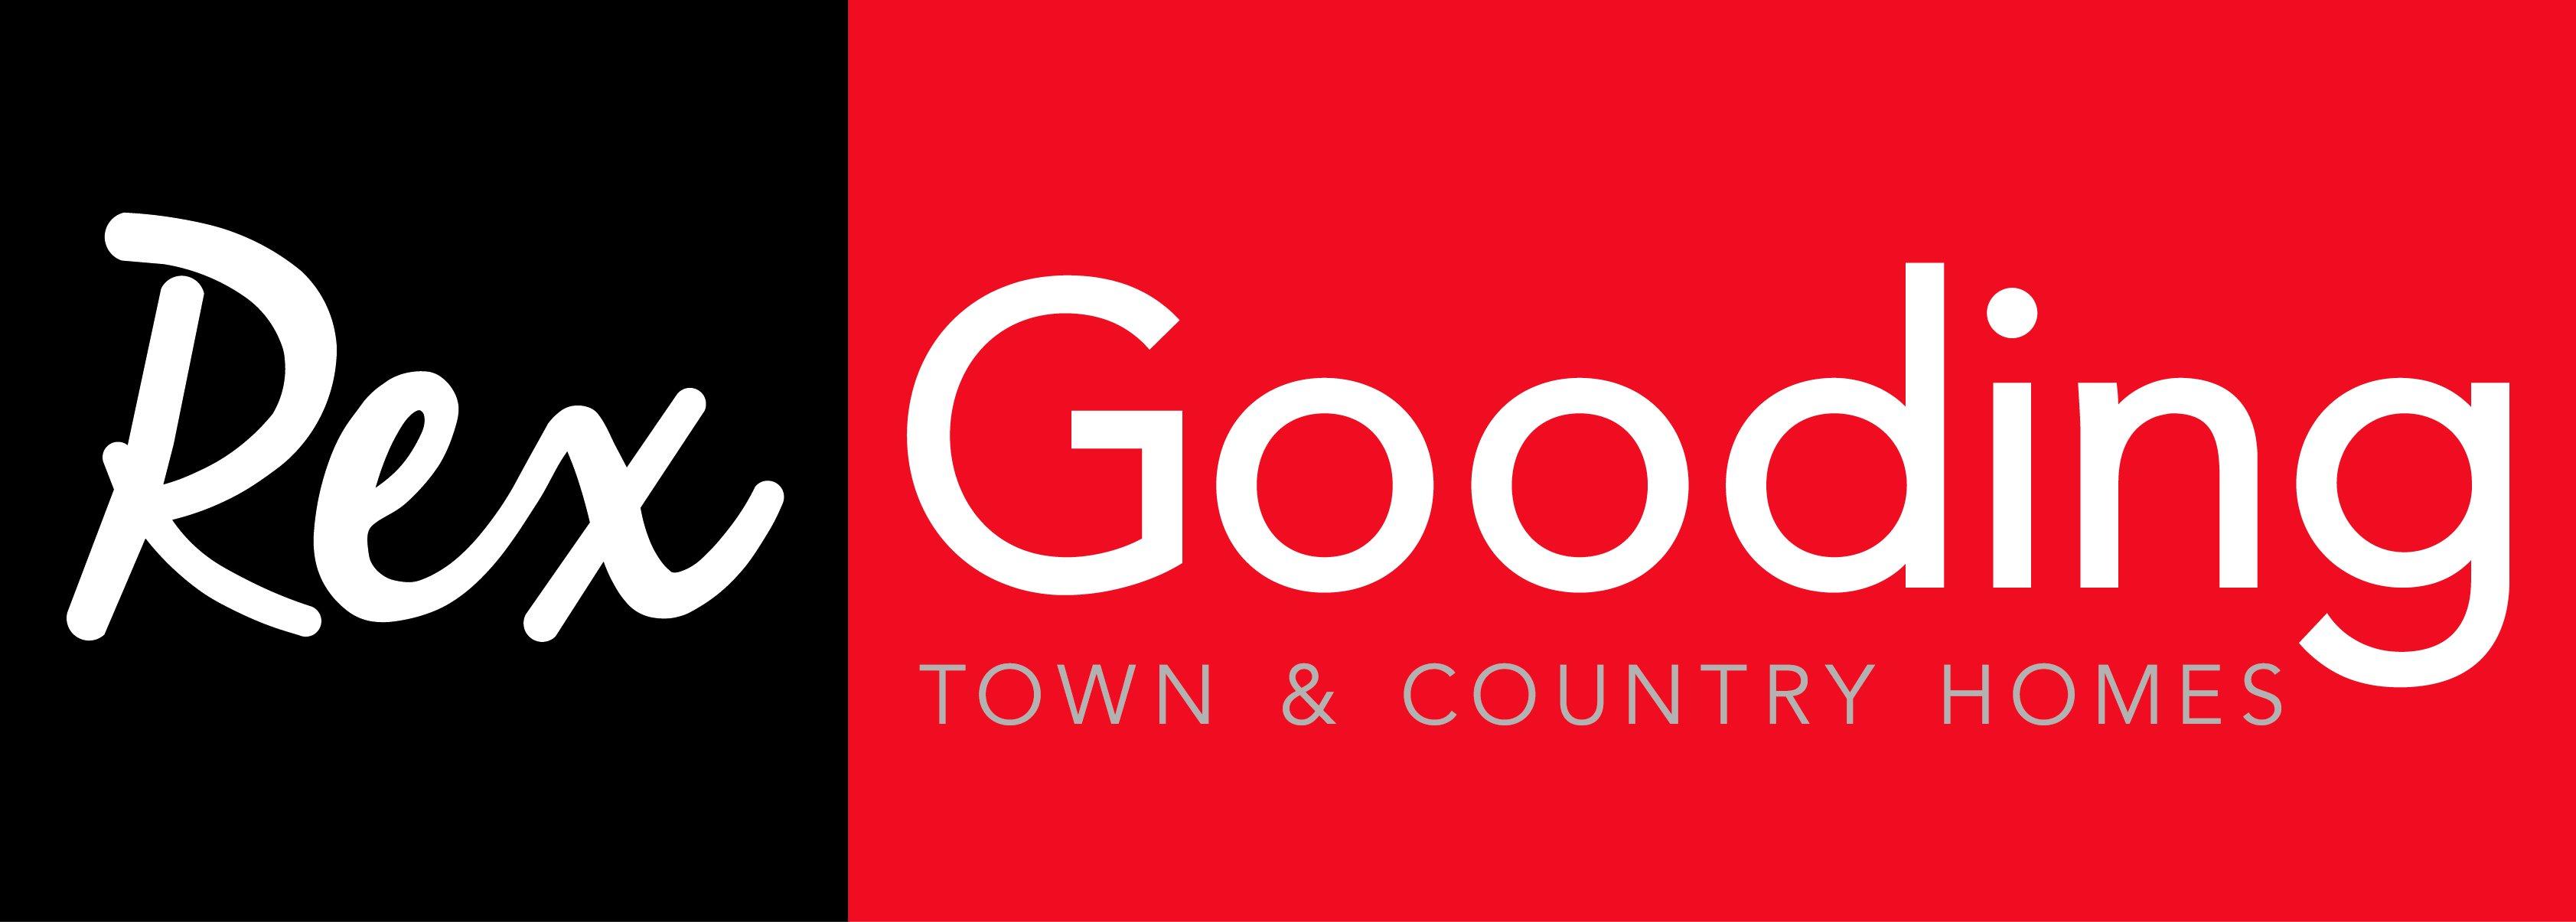 Rex Gooding Logo Town Country CMYK13330 2